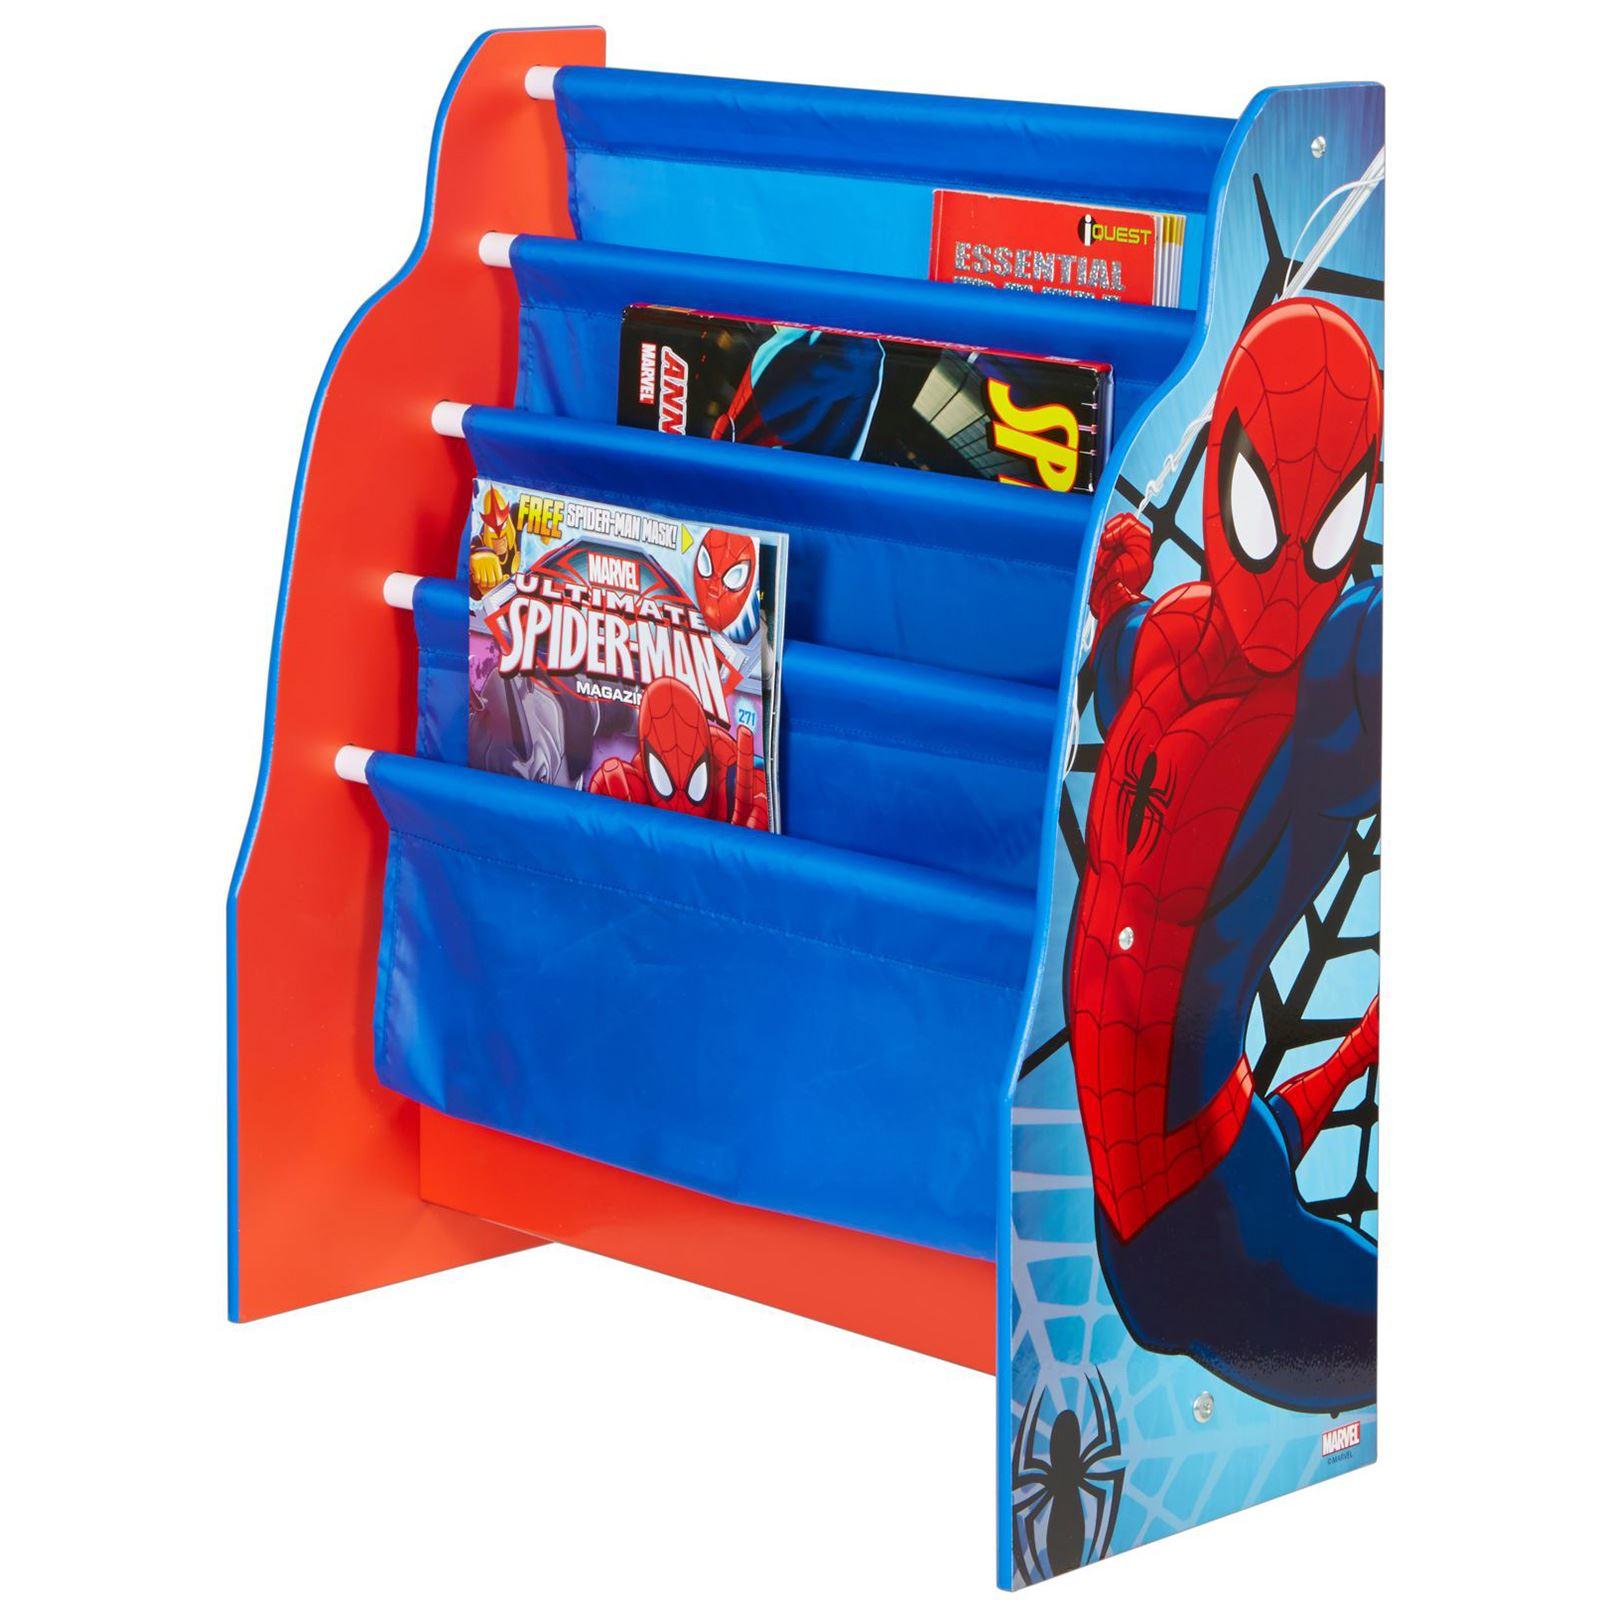 SPIDERMAN SLING BOOKCASE TOY BOX 6 BIN STORAGE UNIT